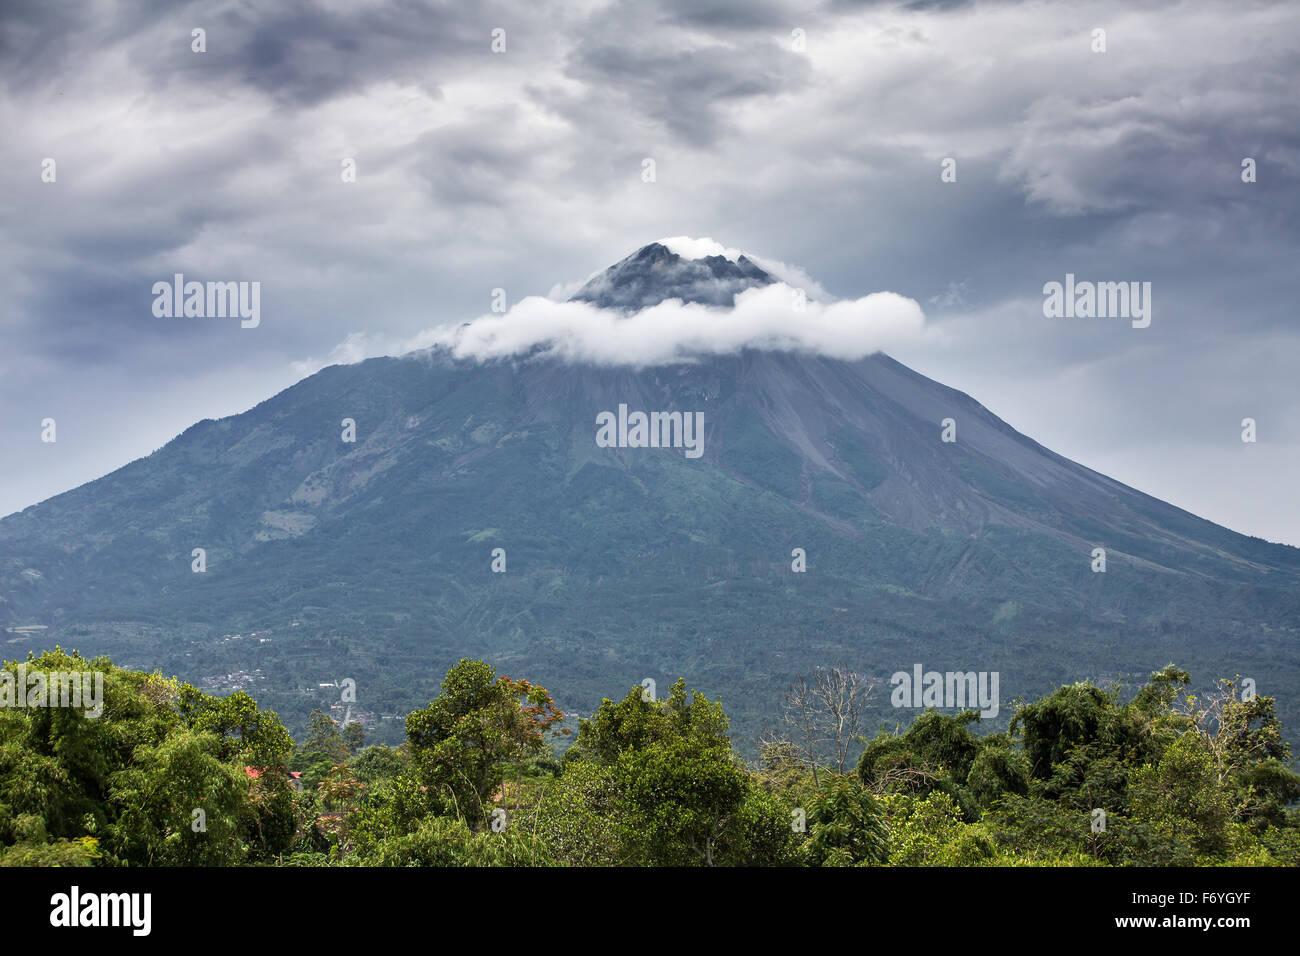 Mountain Merapi volcano, Java, Indonesia - Stock Image